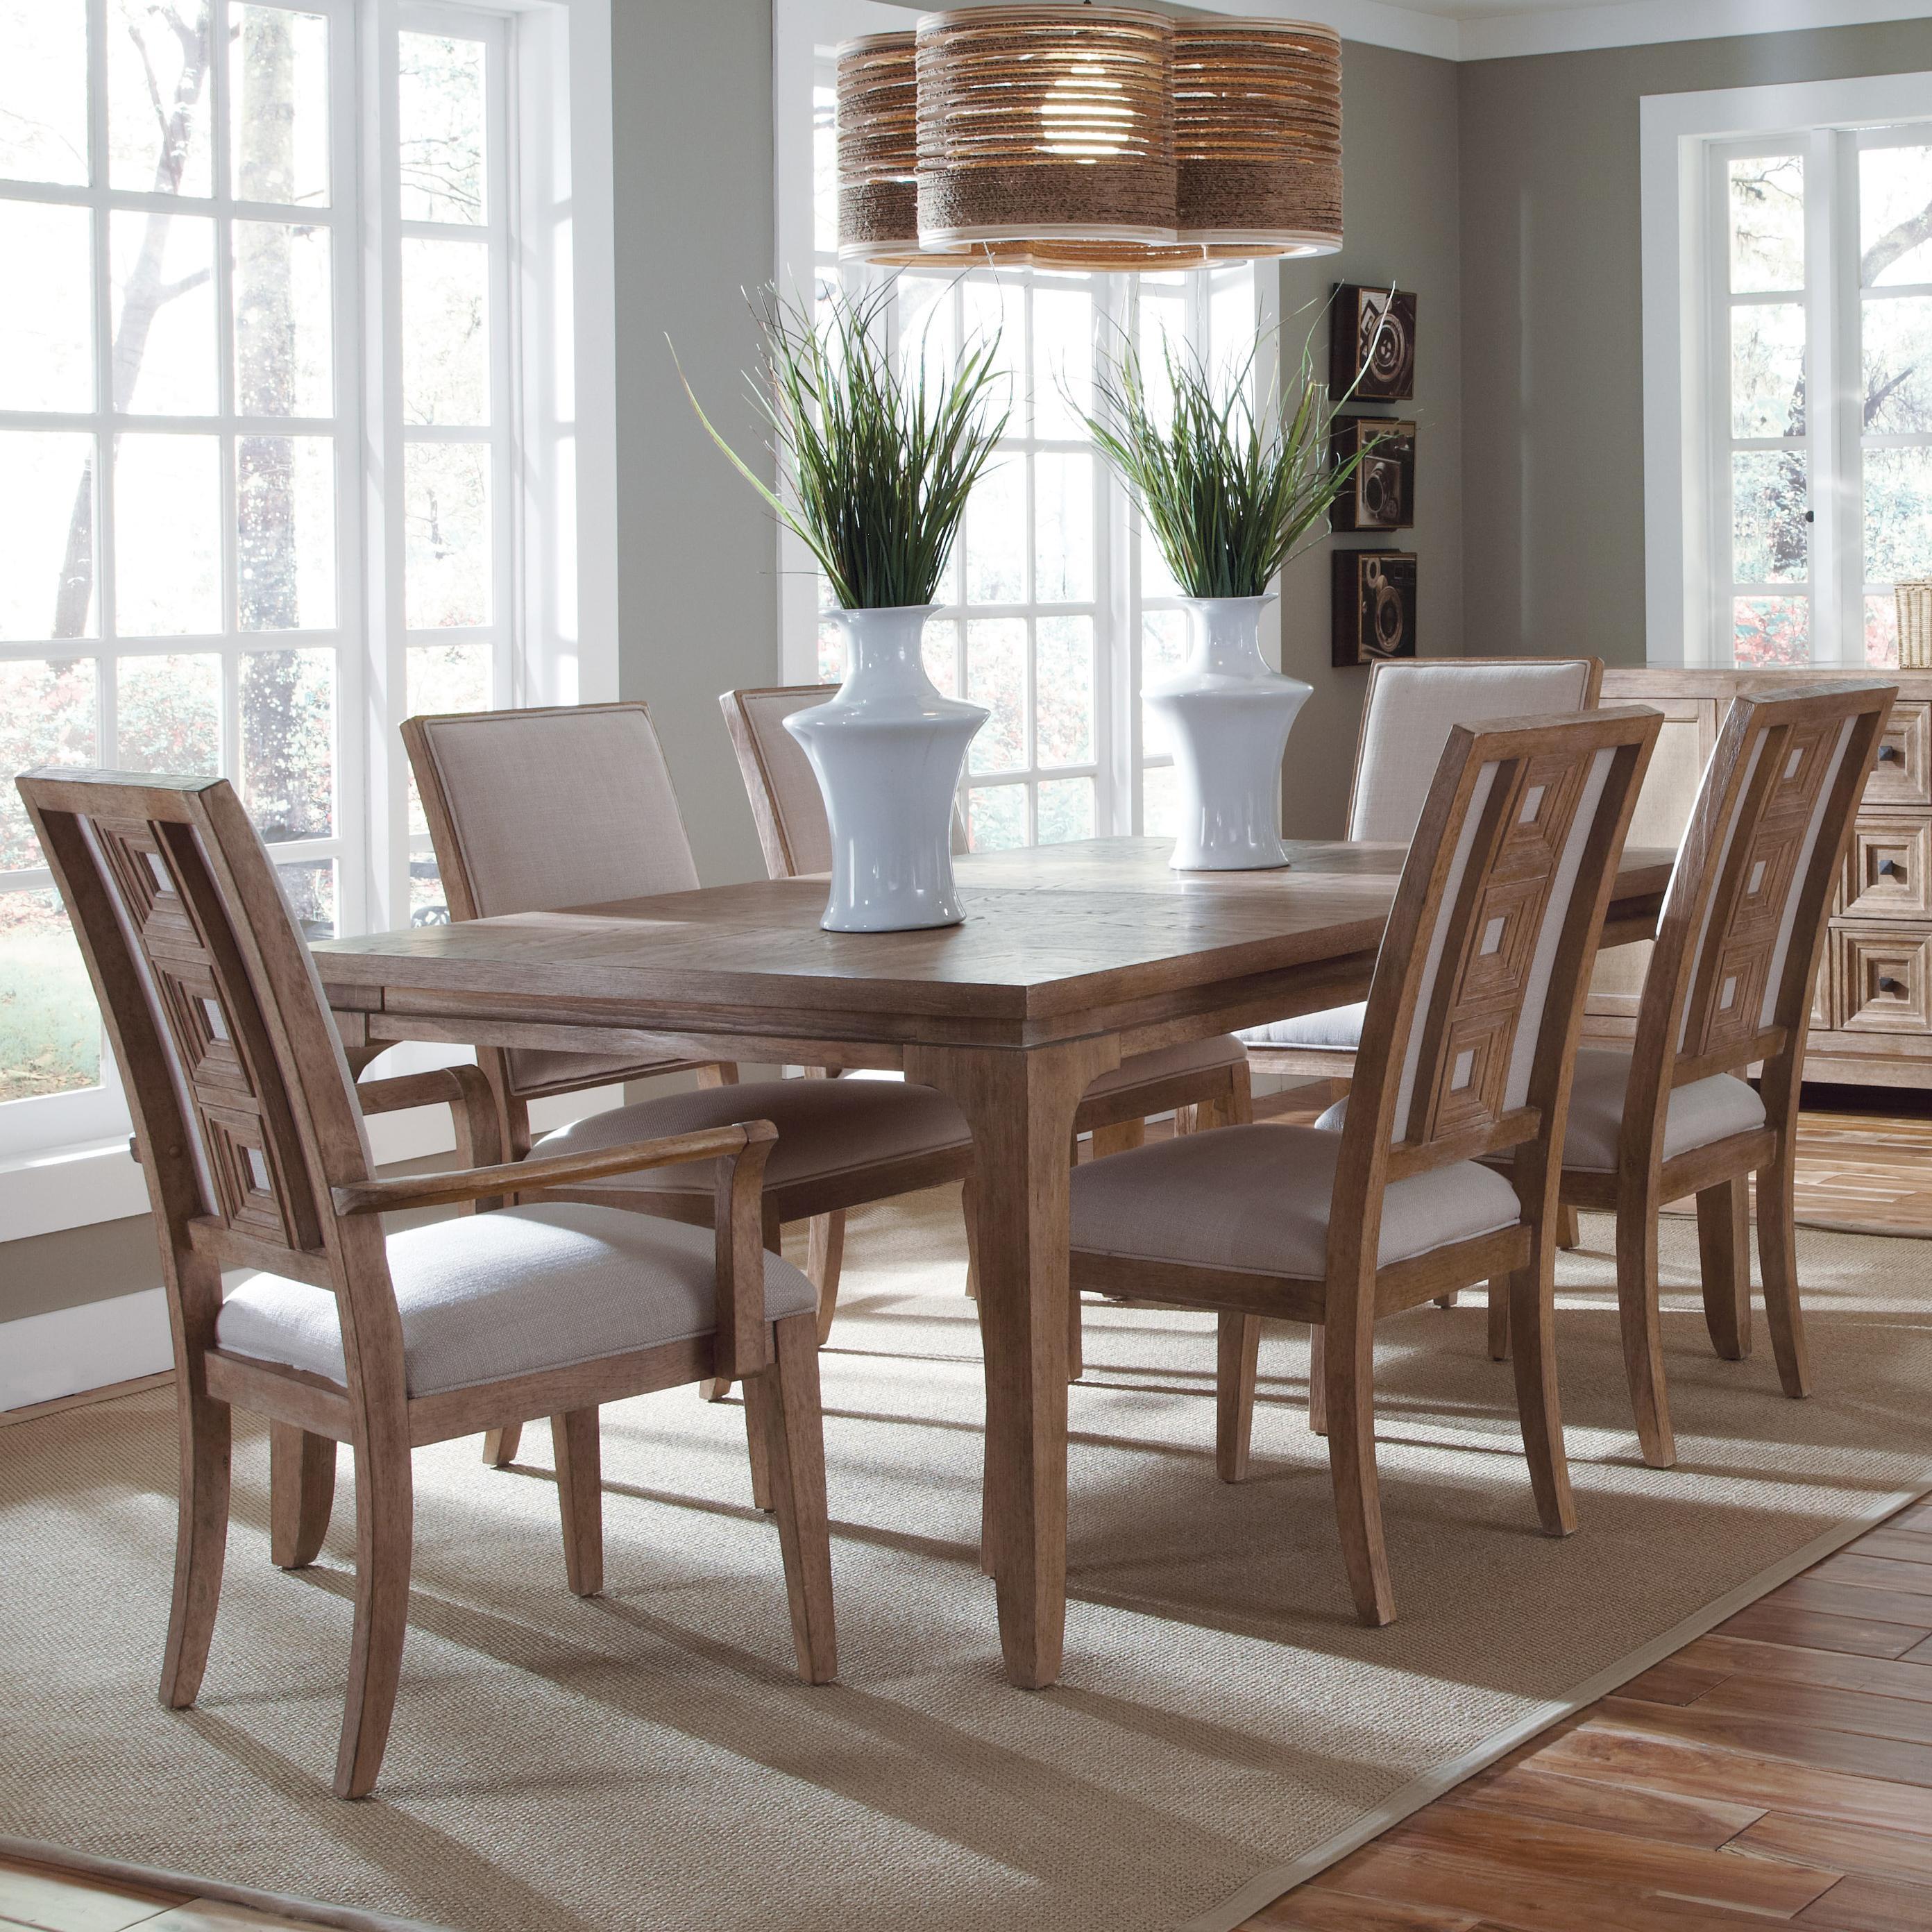 Belfort Signature Madera Leg Dining Table Set - Item Number: 192220-2303+2x192203+4x192202